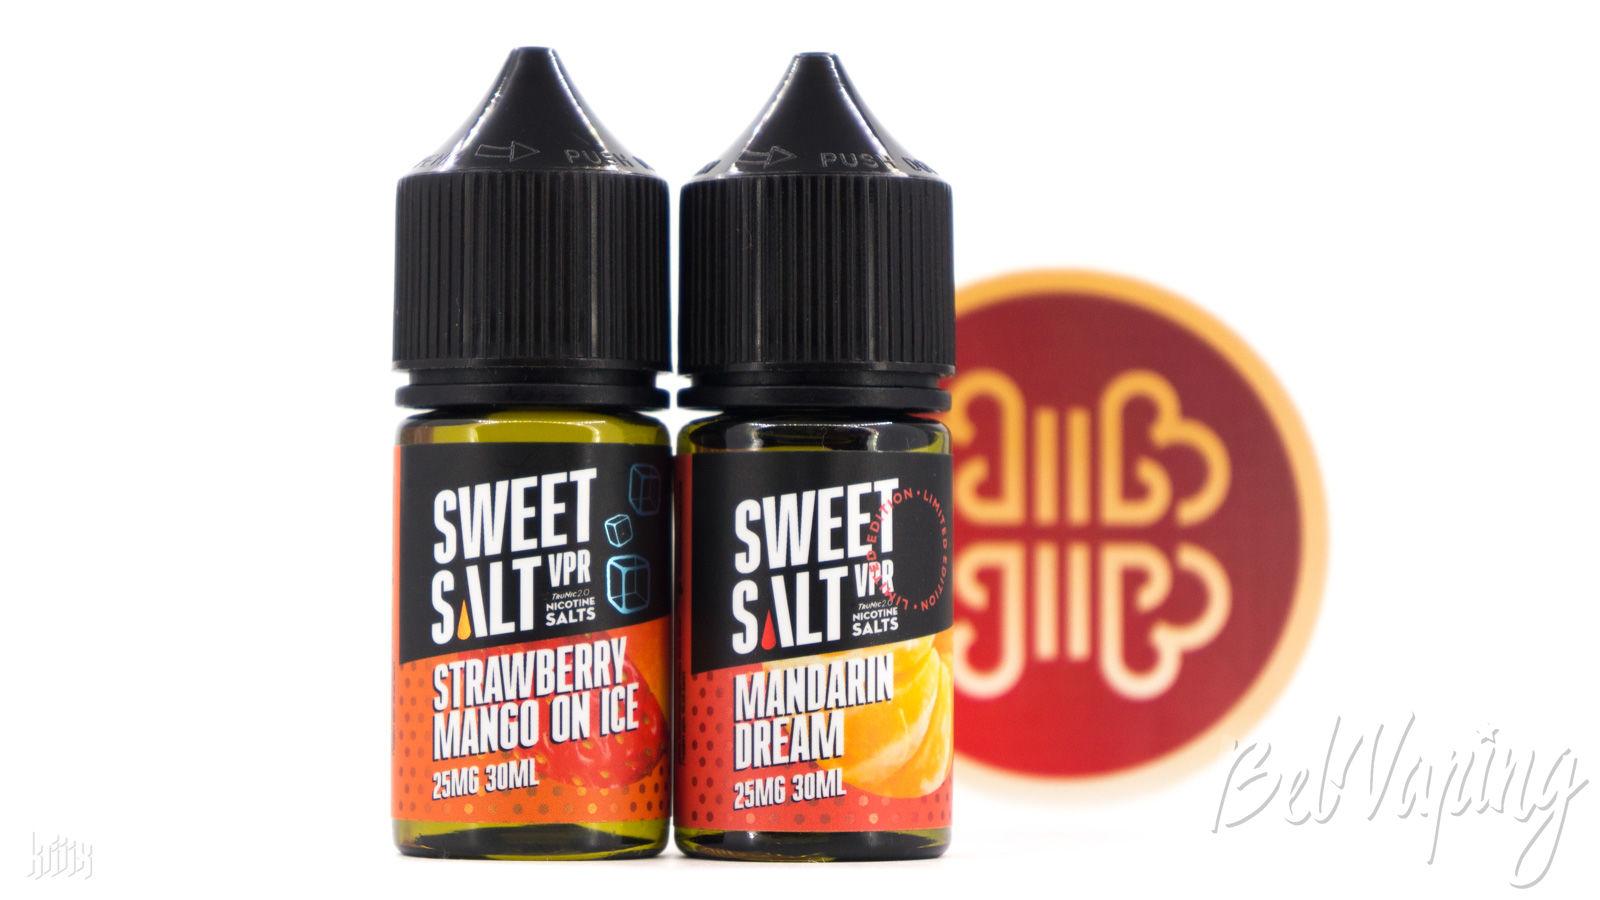 Жидкости Sweet Salt VPR